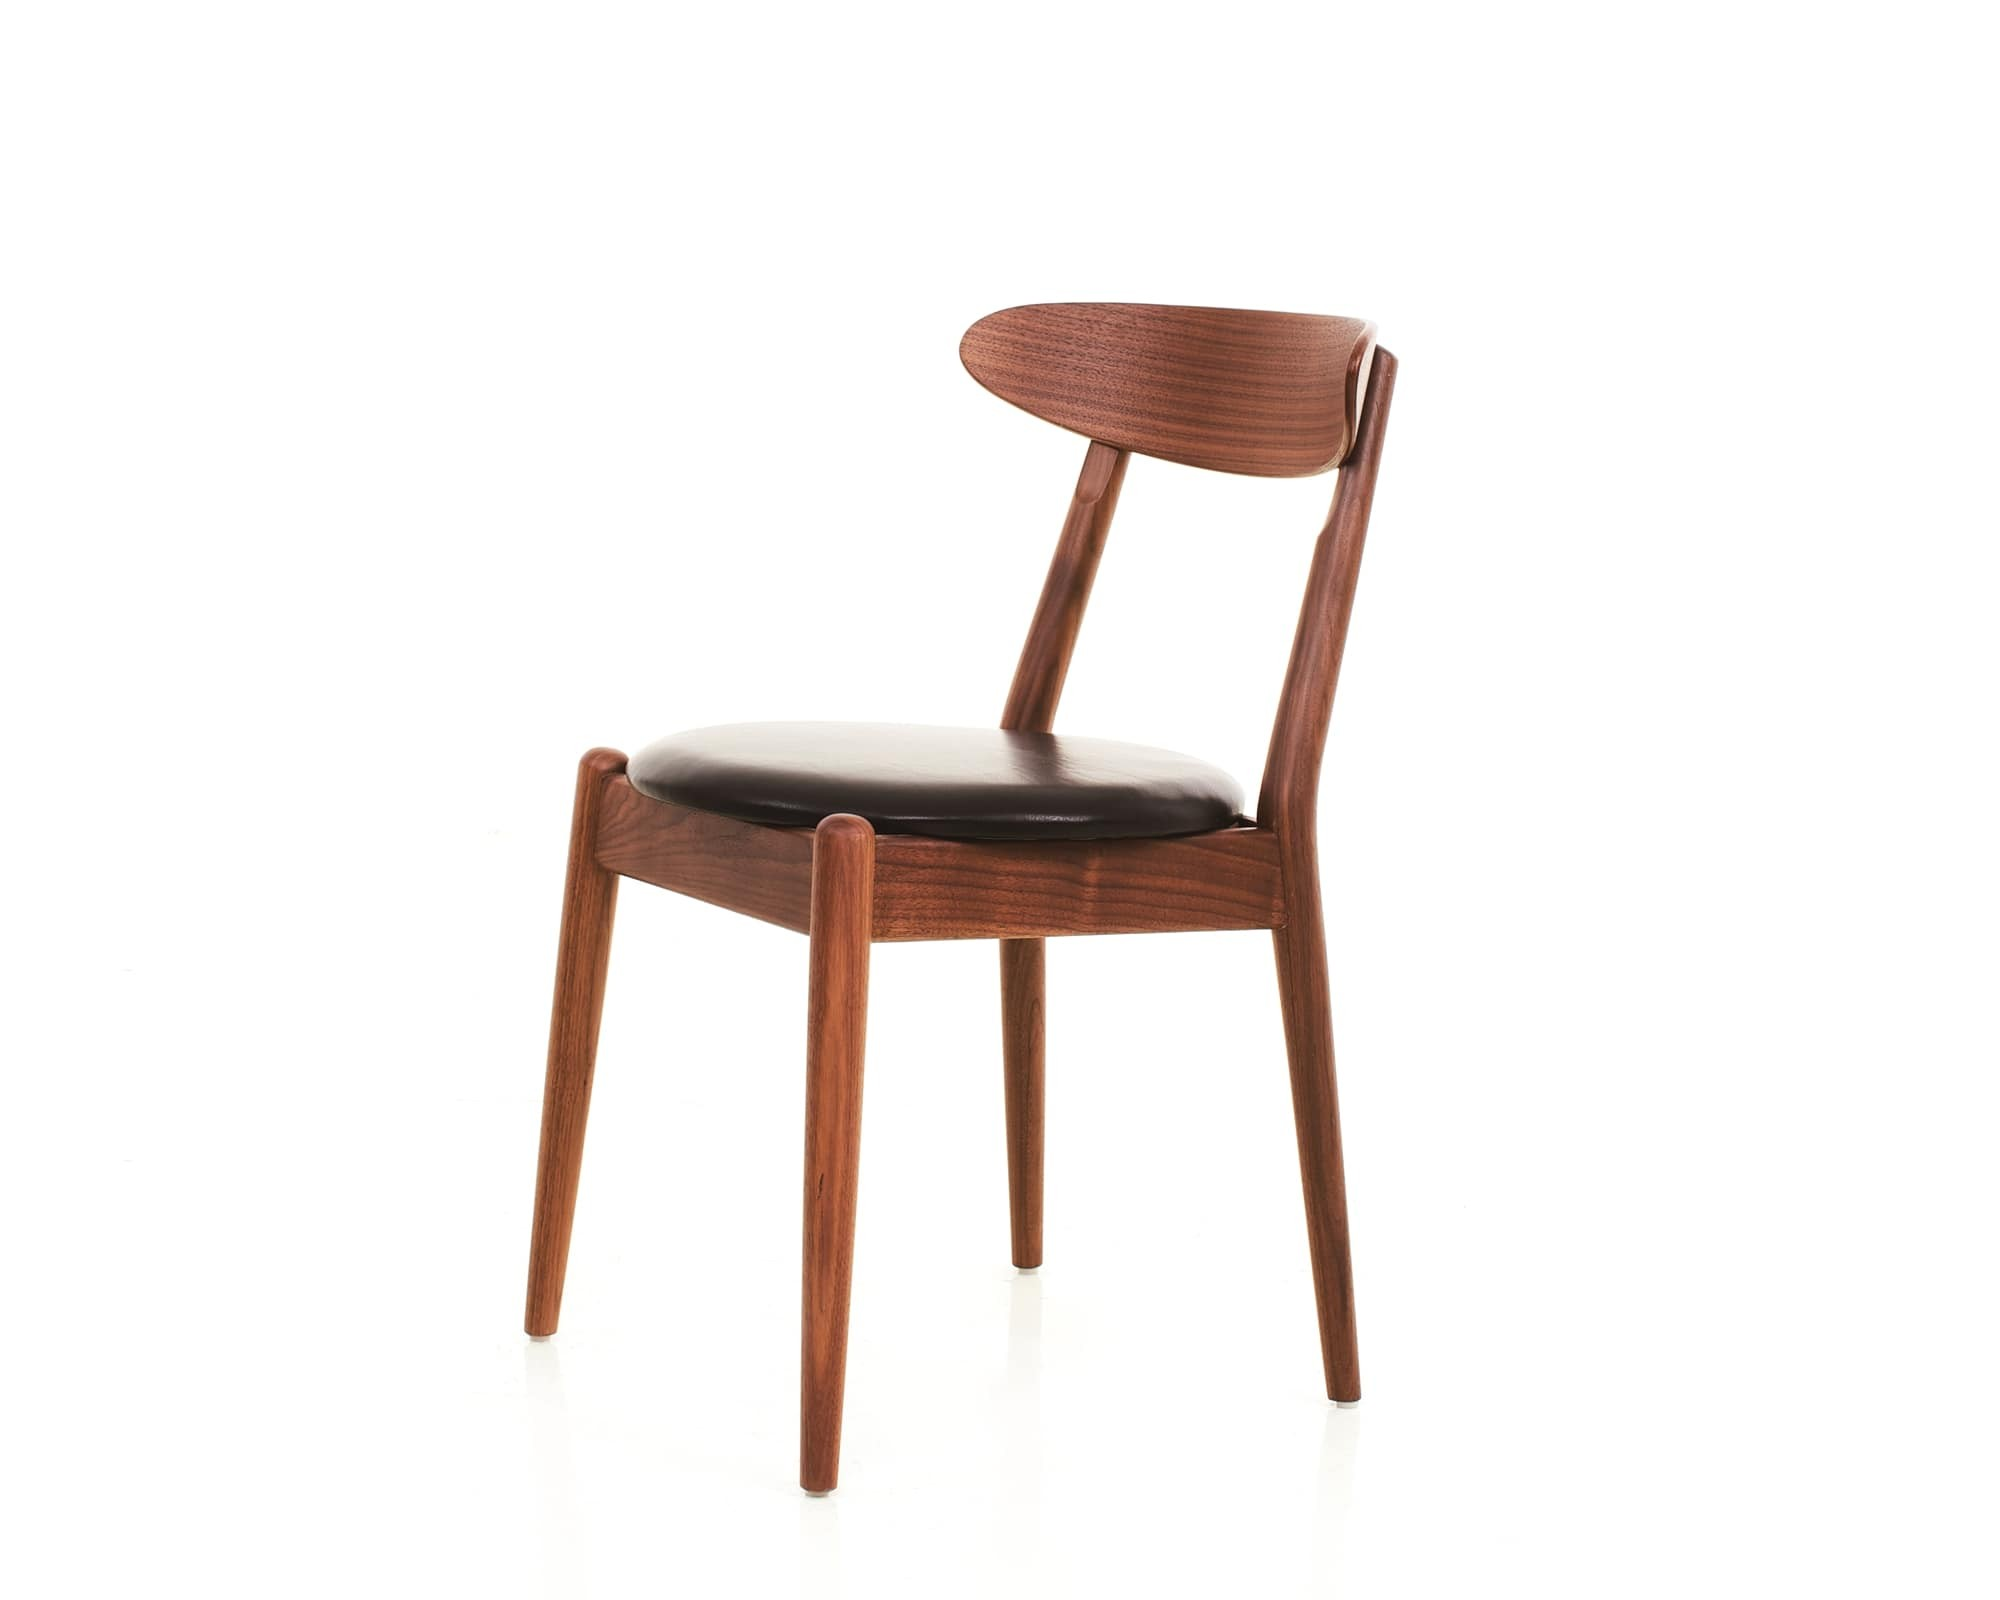 Louisiana Chair (1958)